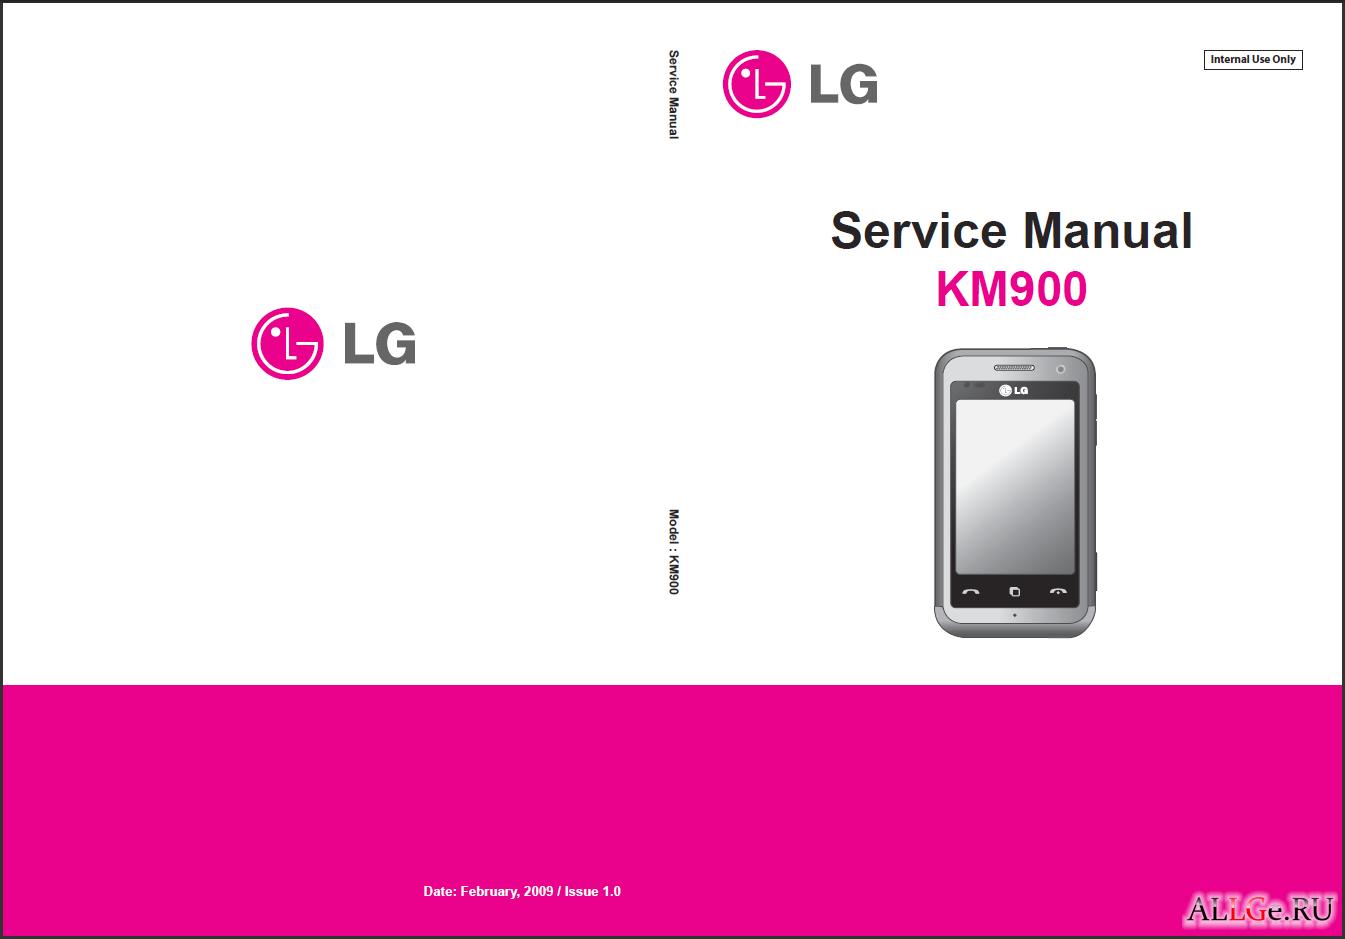 Schematic Service Manual KM900 - это Сервисное руководство LG KM900 со схемами и чертежами...